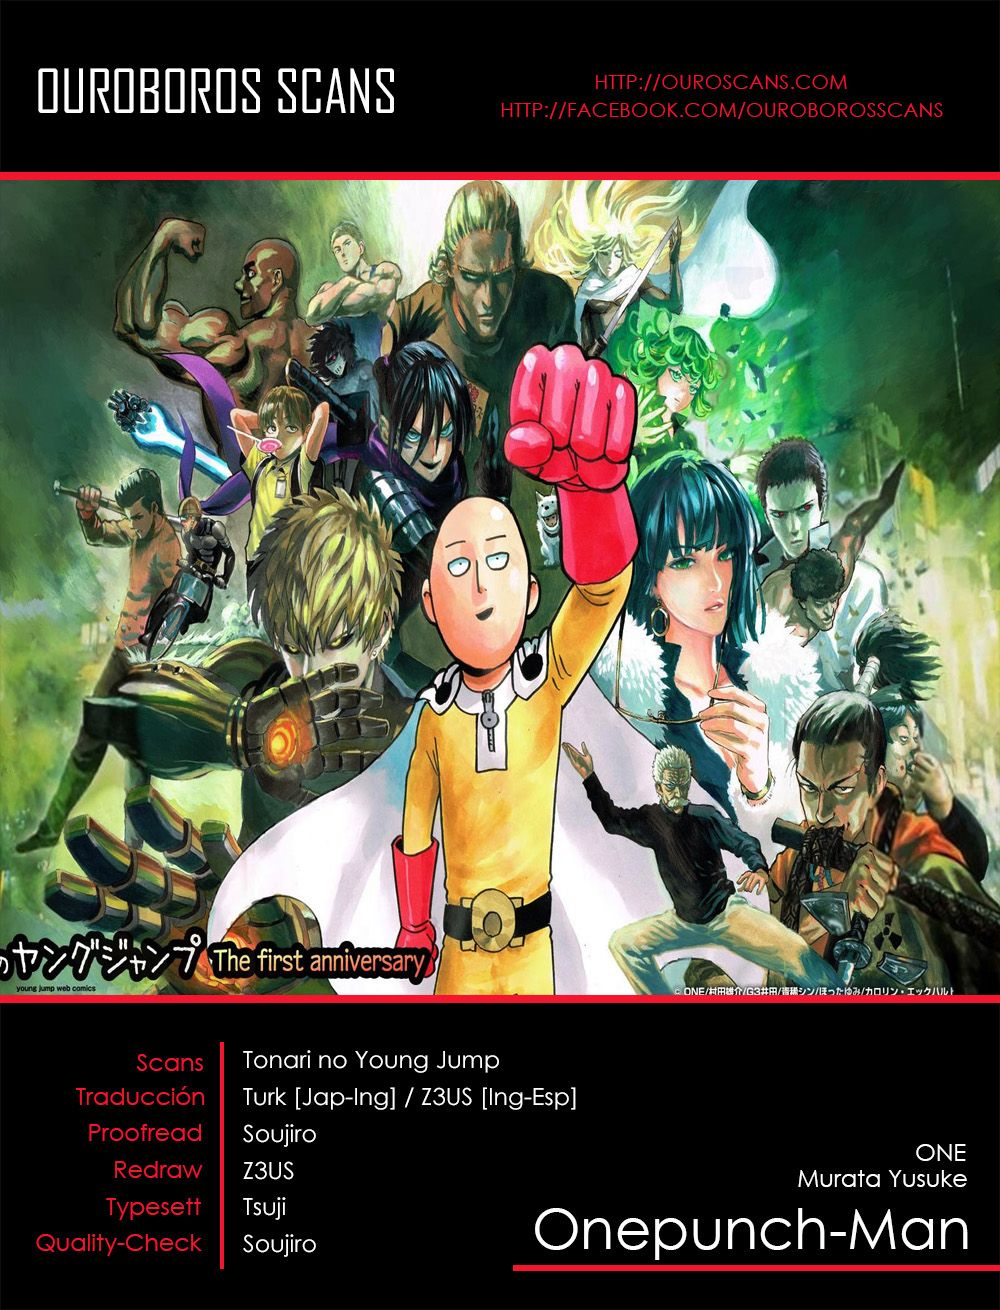 http://c5.ninemanga.com/es_manga/21/14805/462475/f1d8dca39c965ef4ac71ba1719d4bd83.jpg Page 1